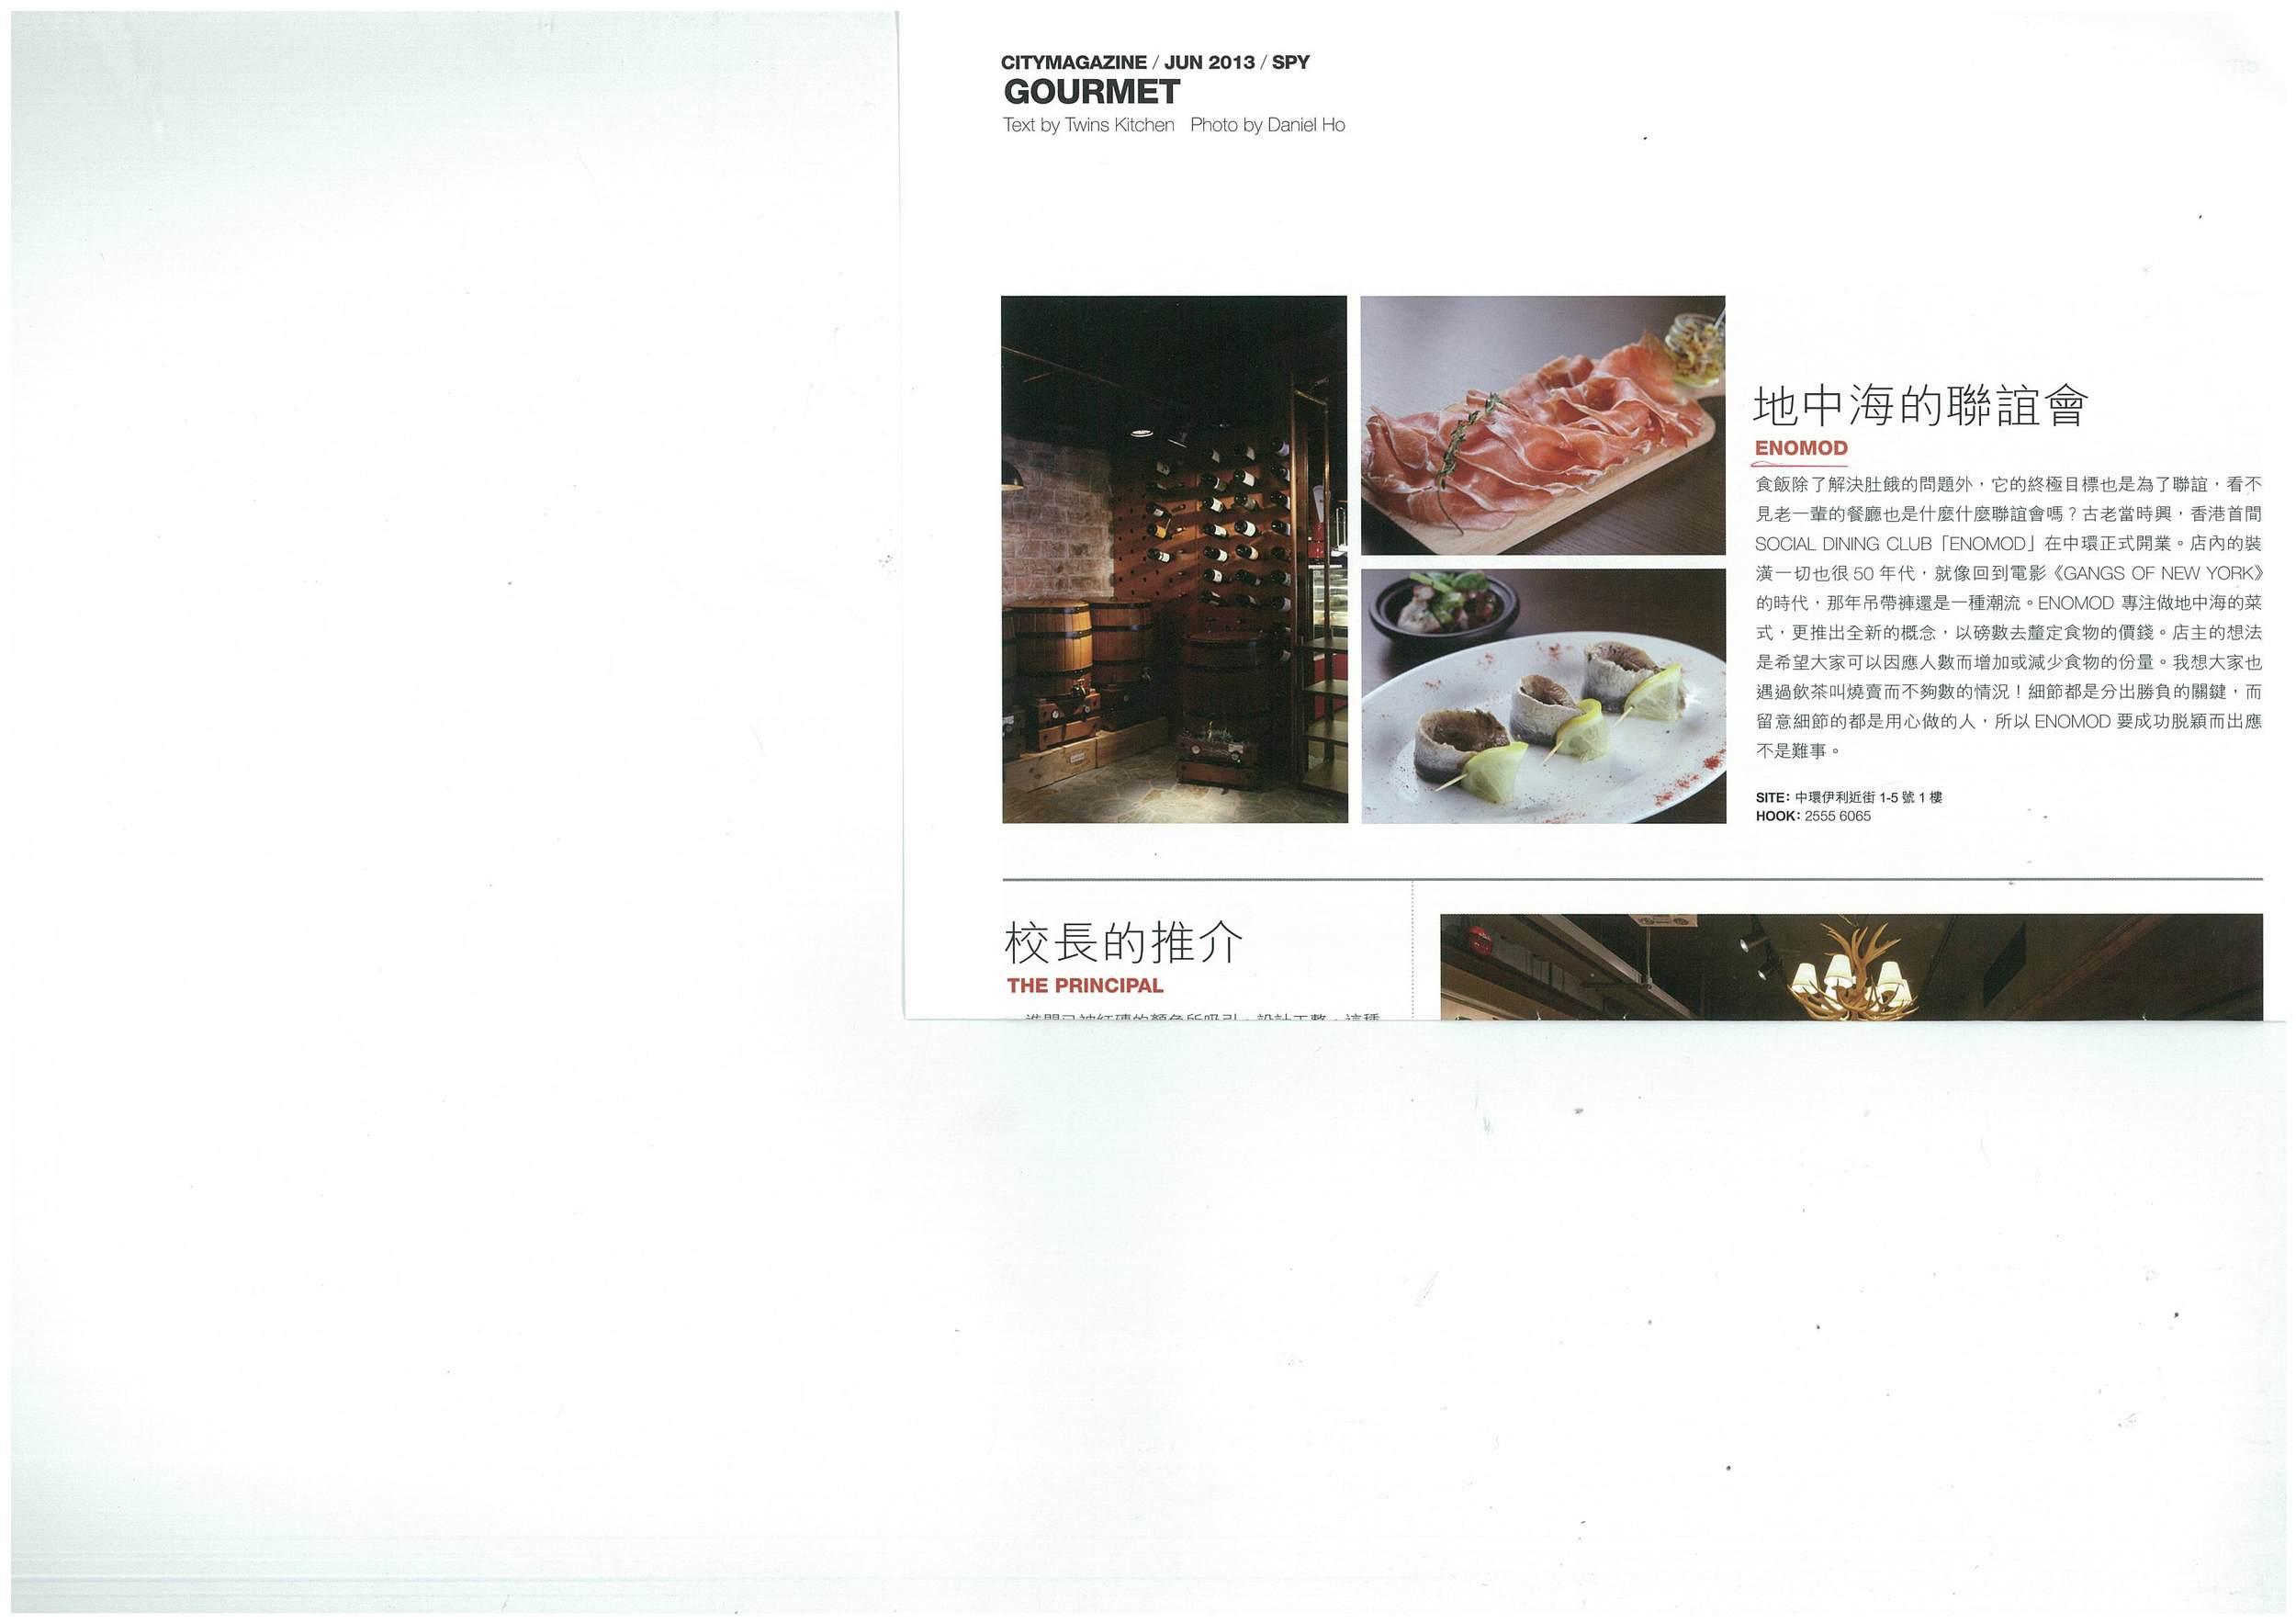 ENOMOD - Jun -City Magazine (P36).jpg